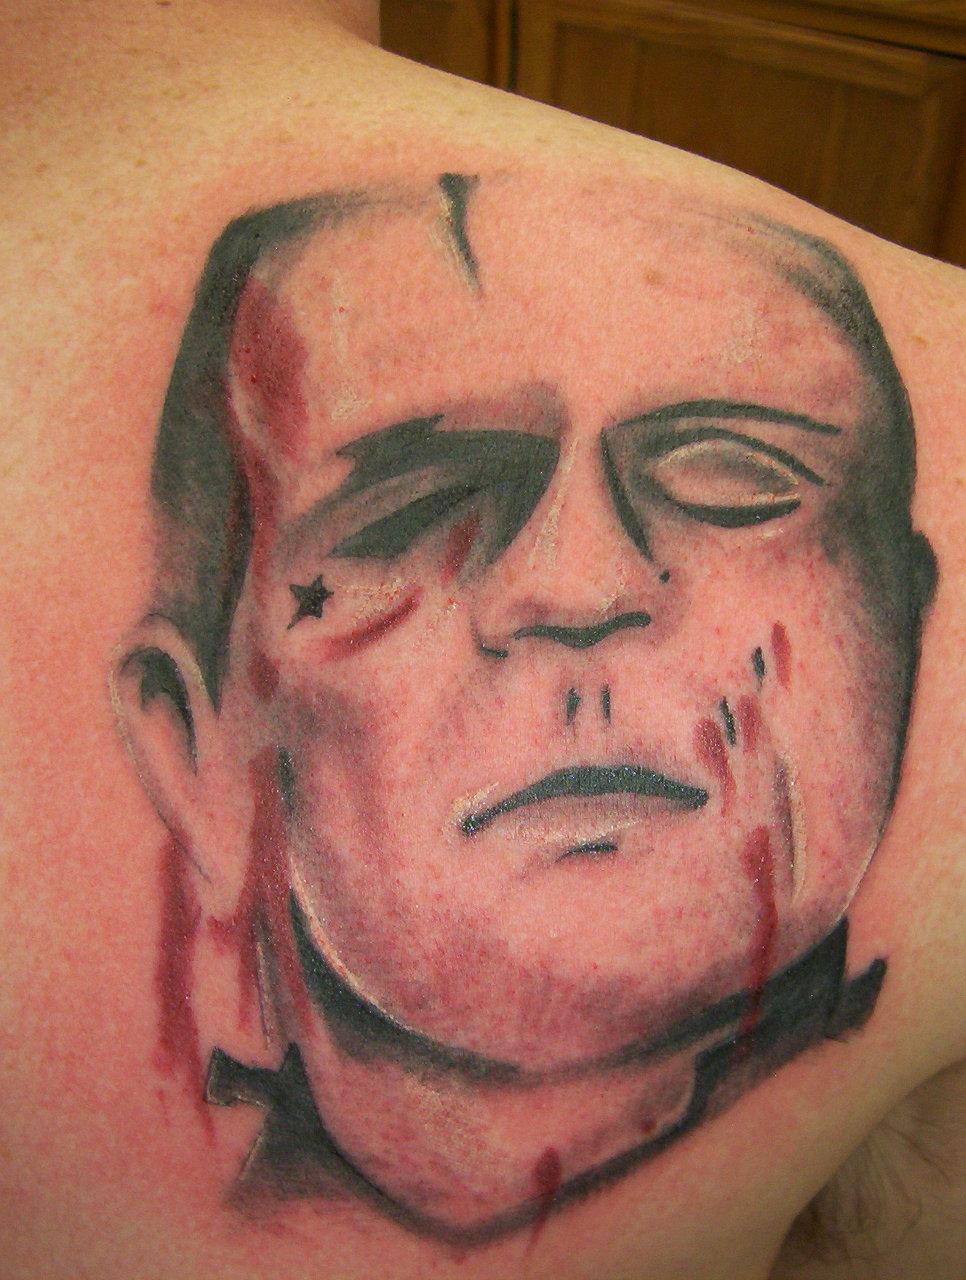 frankenstien tattoo